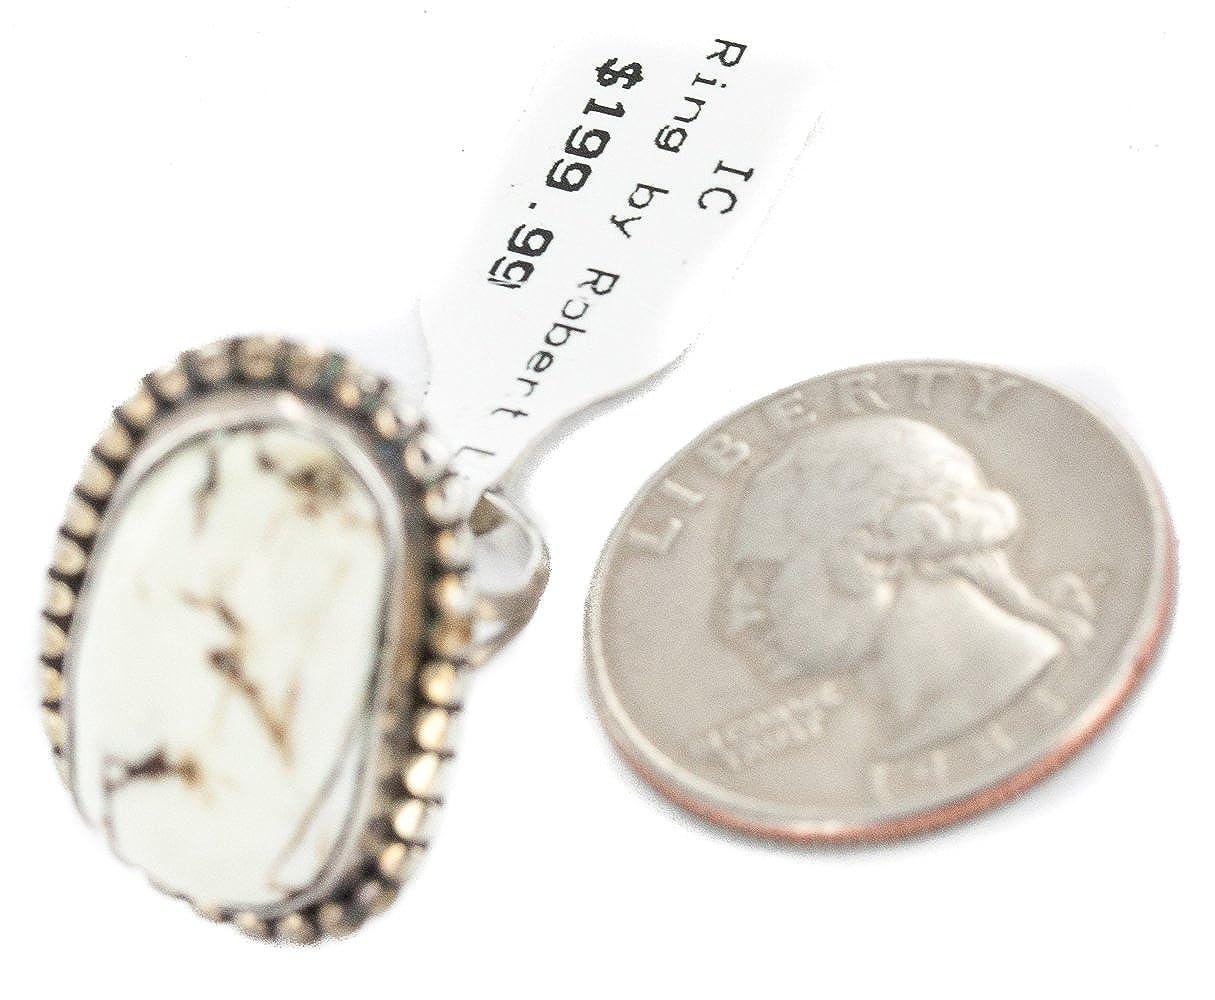 $200Tag Silver Certified Navajo Natural White Buffalo Native American Ring 16959-1 Made by Loma Siiva